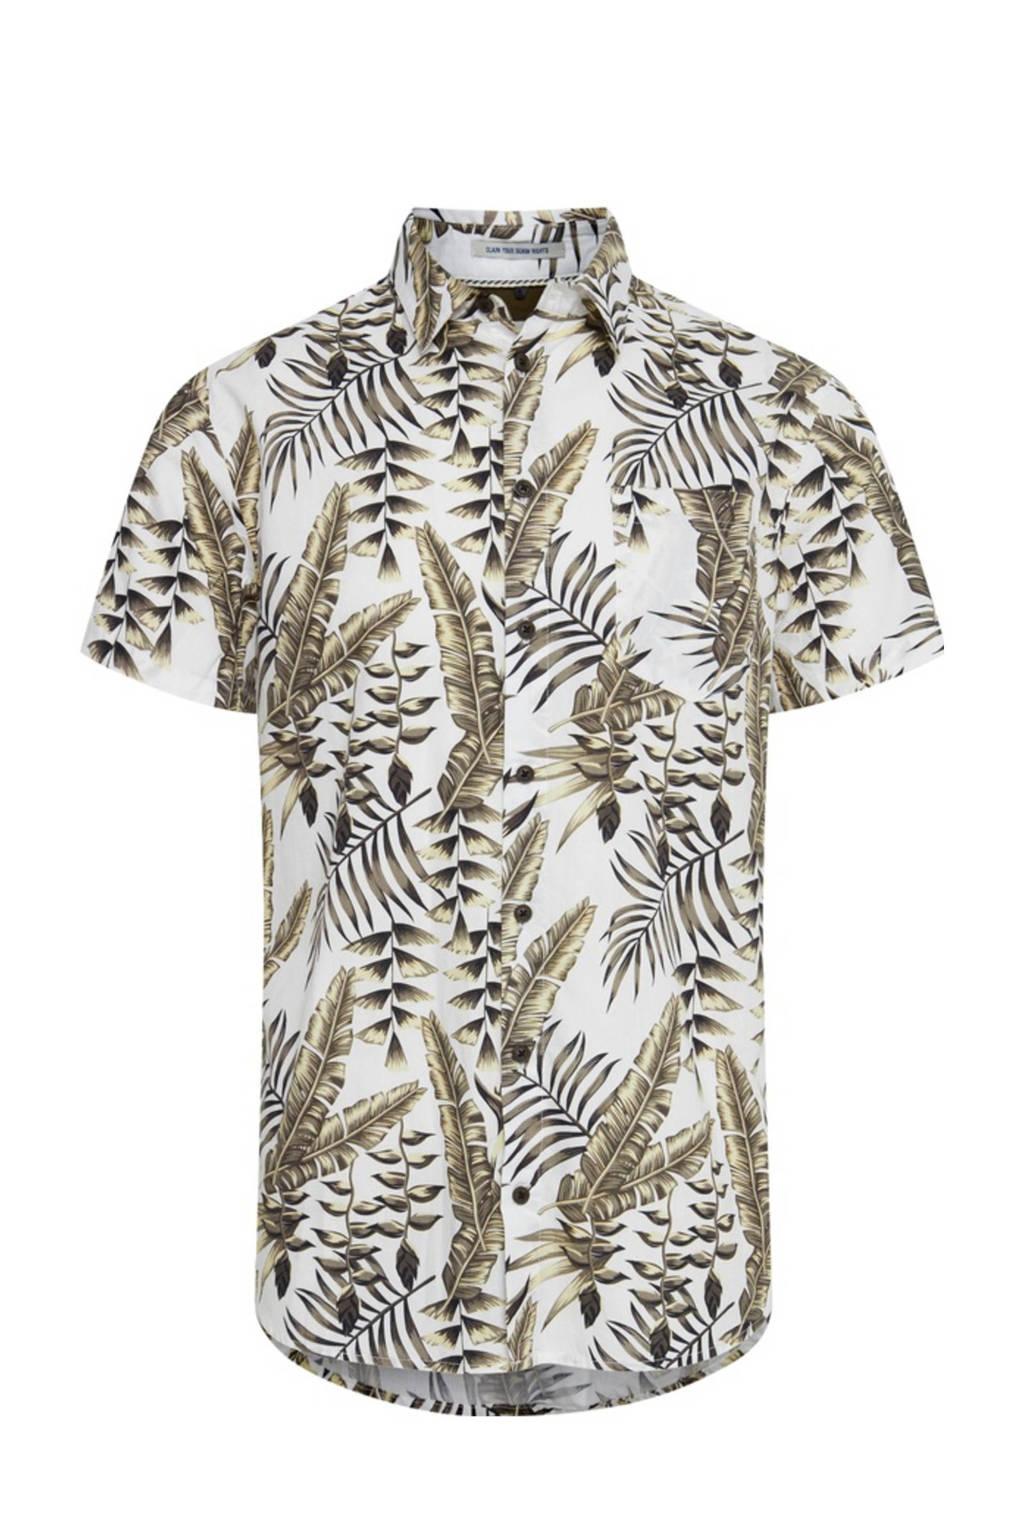 Blend slim fit overhemd met all over print ecru/kaki, Ecru/kaki